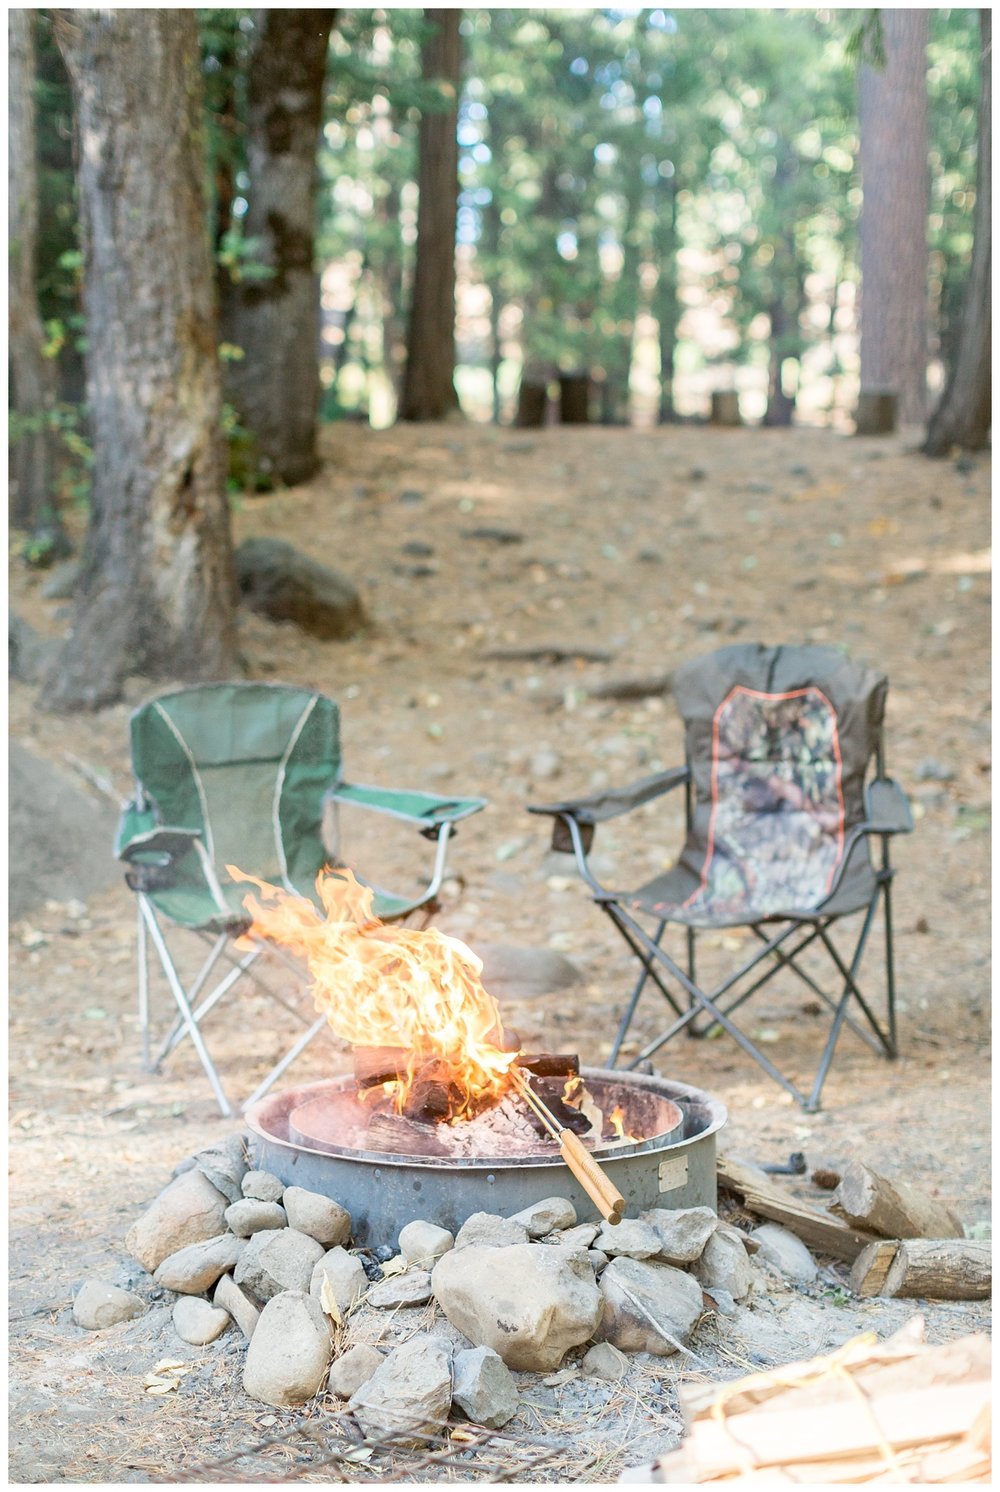 Butte-Meadows-Camping-Adventure_1149.jpg